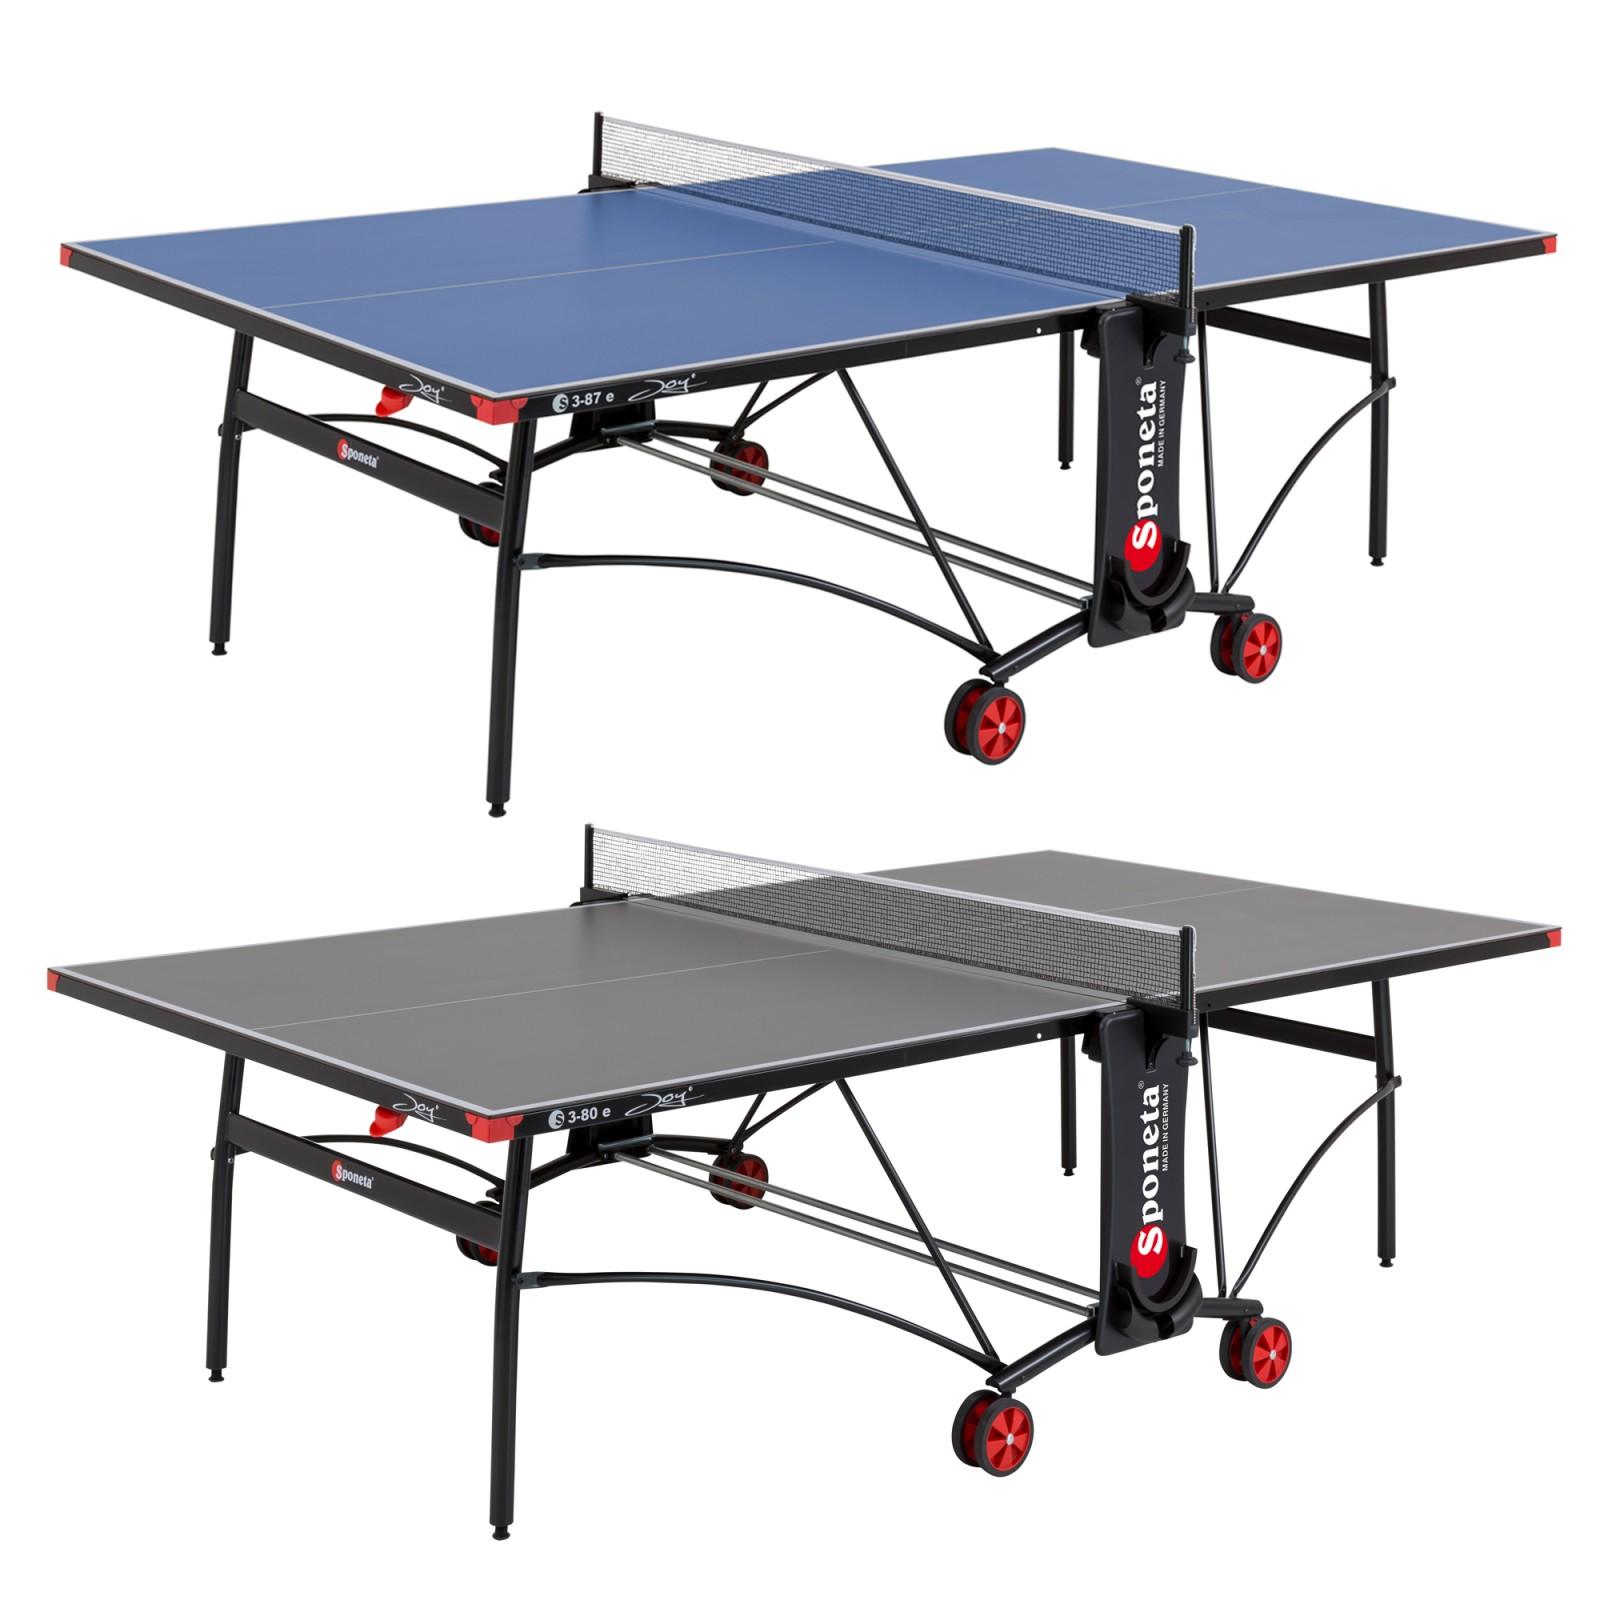 Sponeta table tennis table s3 87e s3 80e joy sport tiedje - Sponeta table tennis table ...